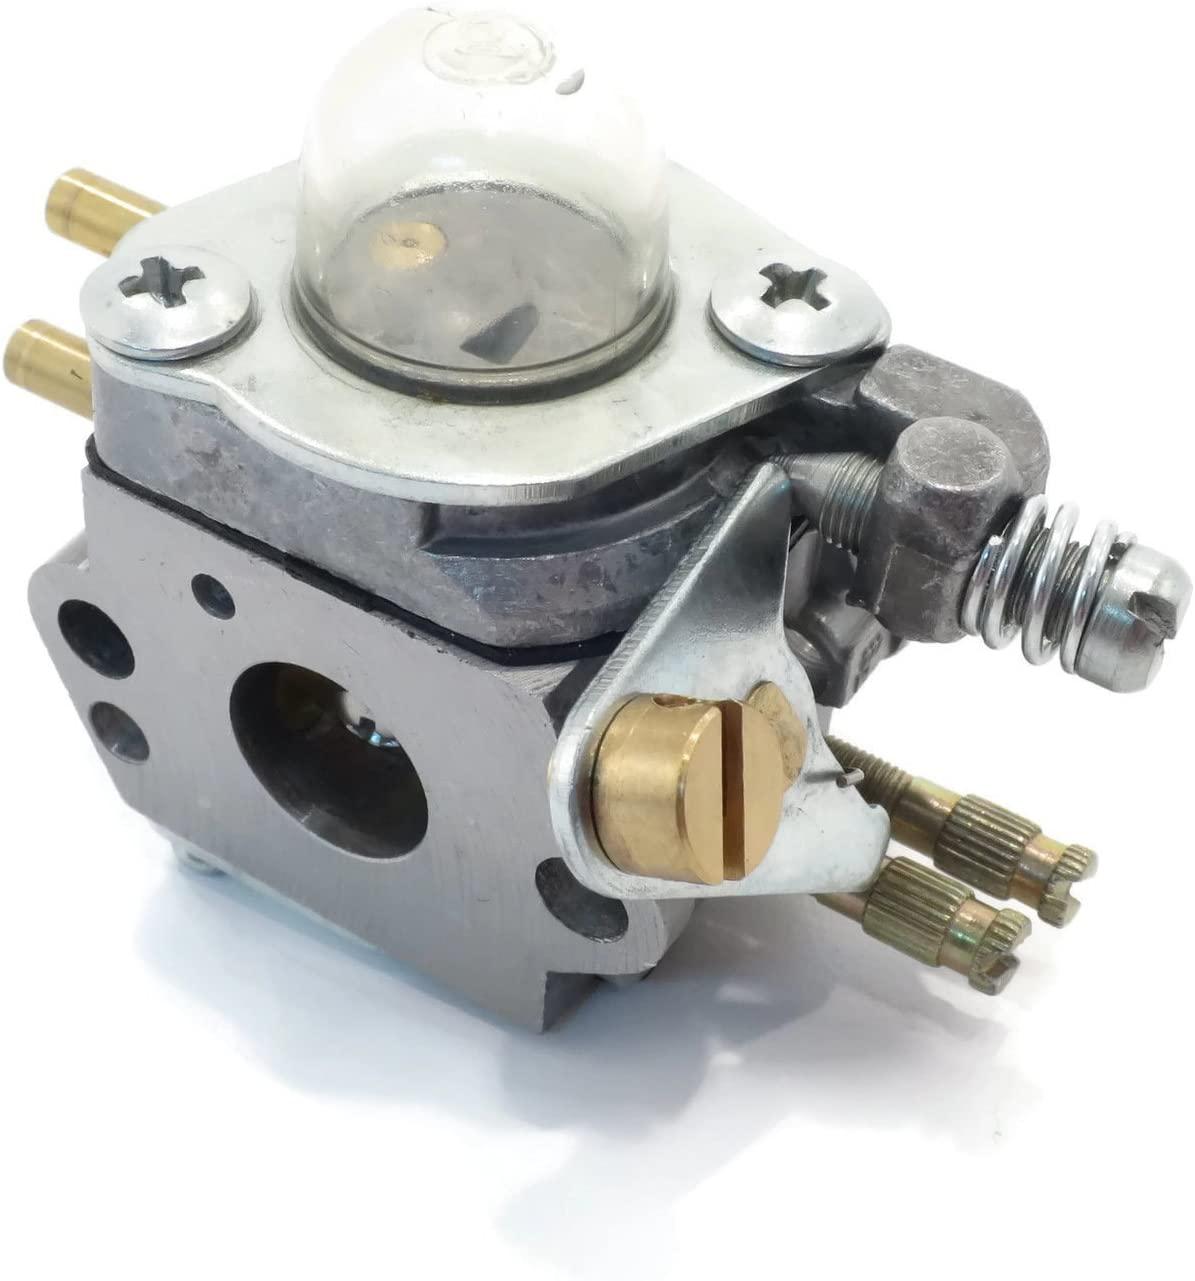 The ROP Shop Carburetor Carb fits Echo SRM2110 PE2000 PP1200 PP800 PPT2100 String Trimmers